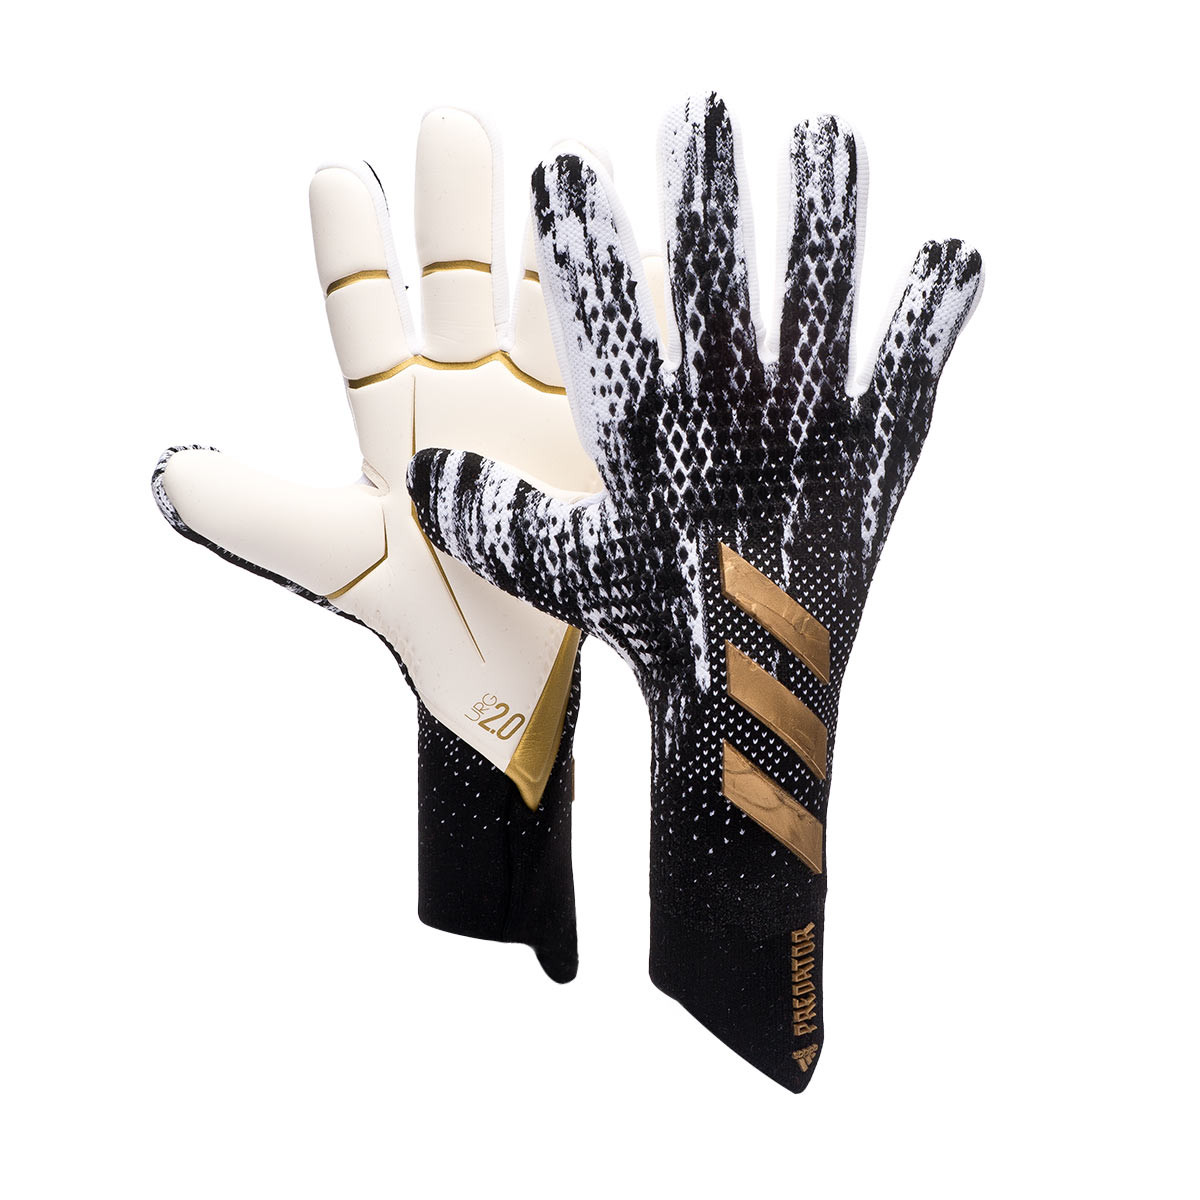 Mejorar Mal funcionamiento Bien educado  Guante de portero adidas Predator Pro Black-White-Gold metallic - Tienda de  fútbol Fútbol Emotion